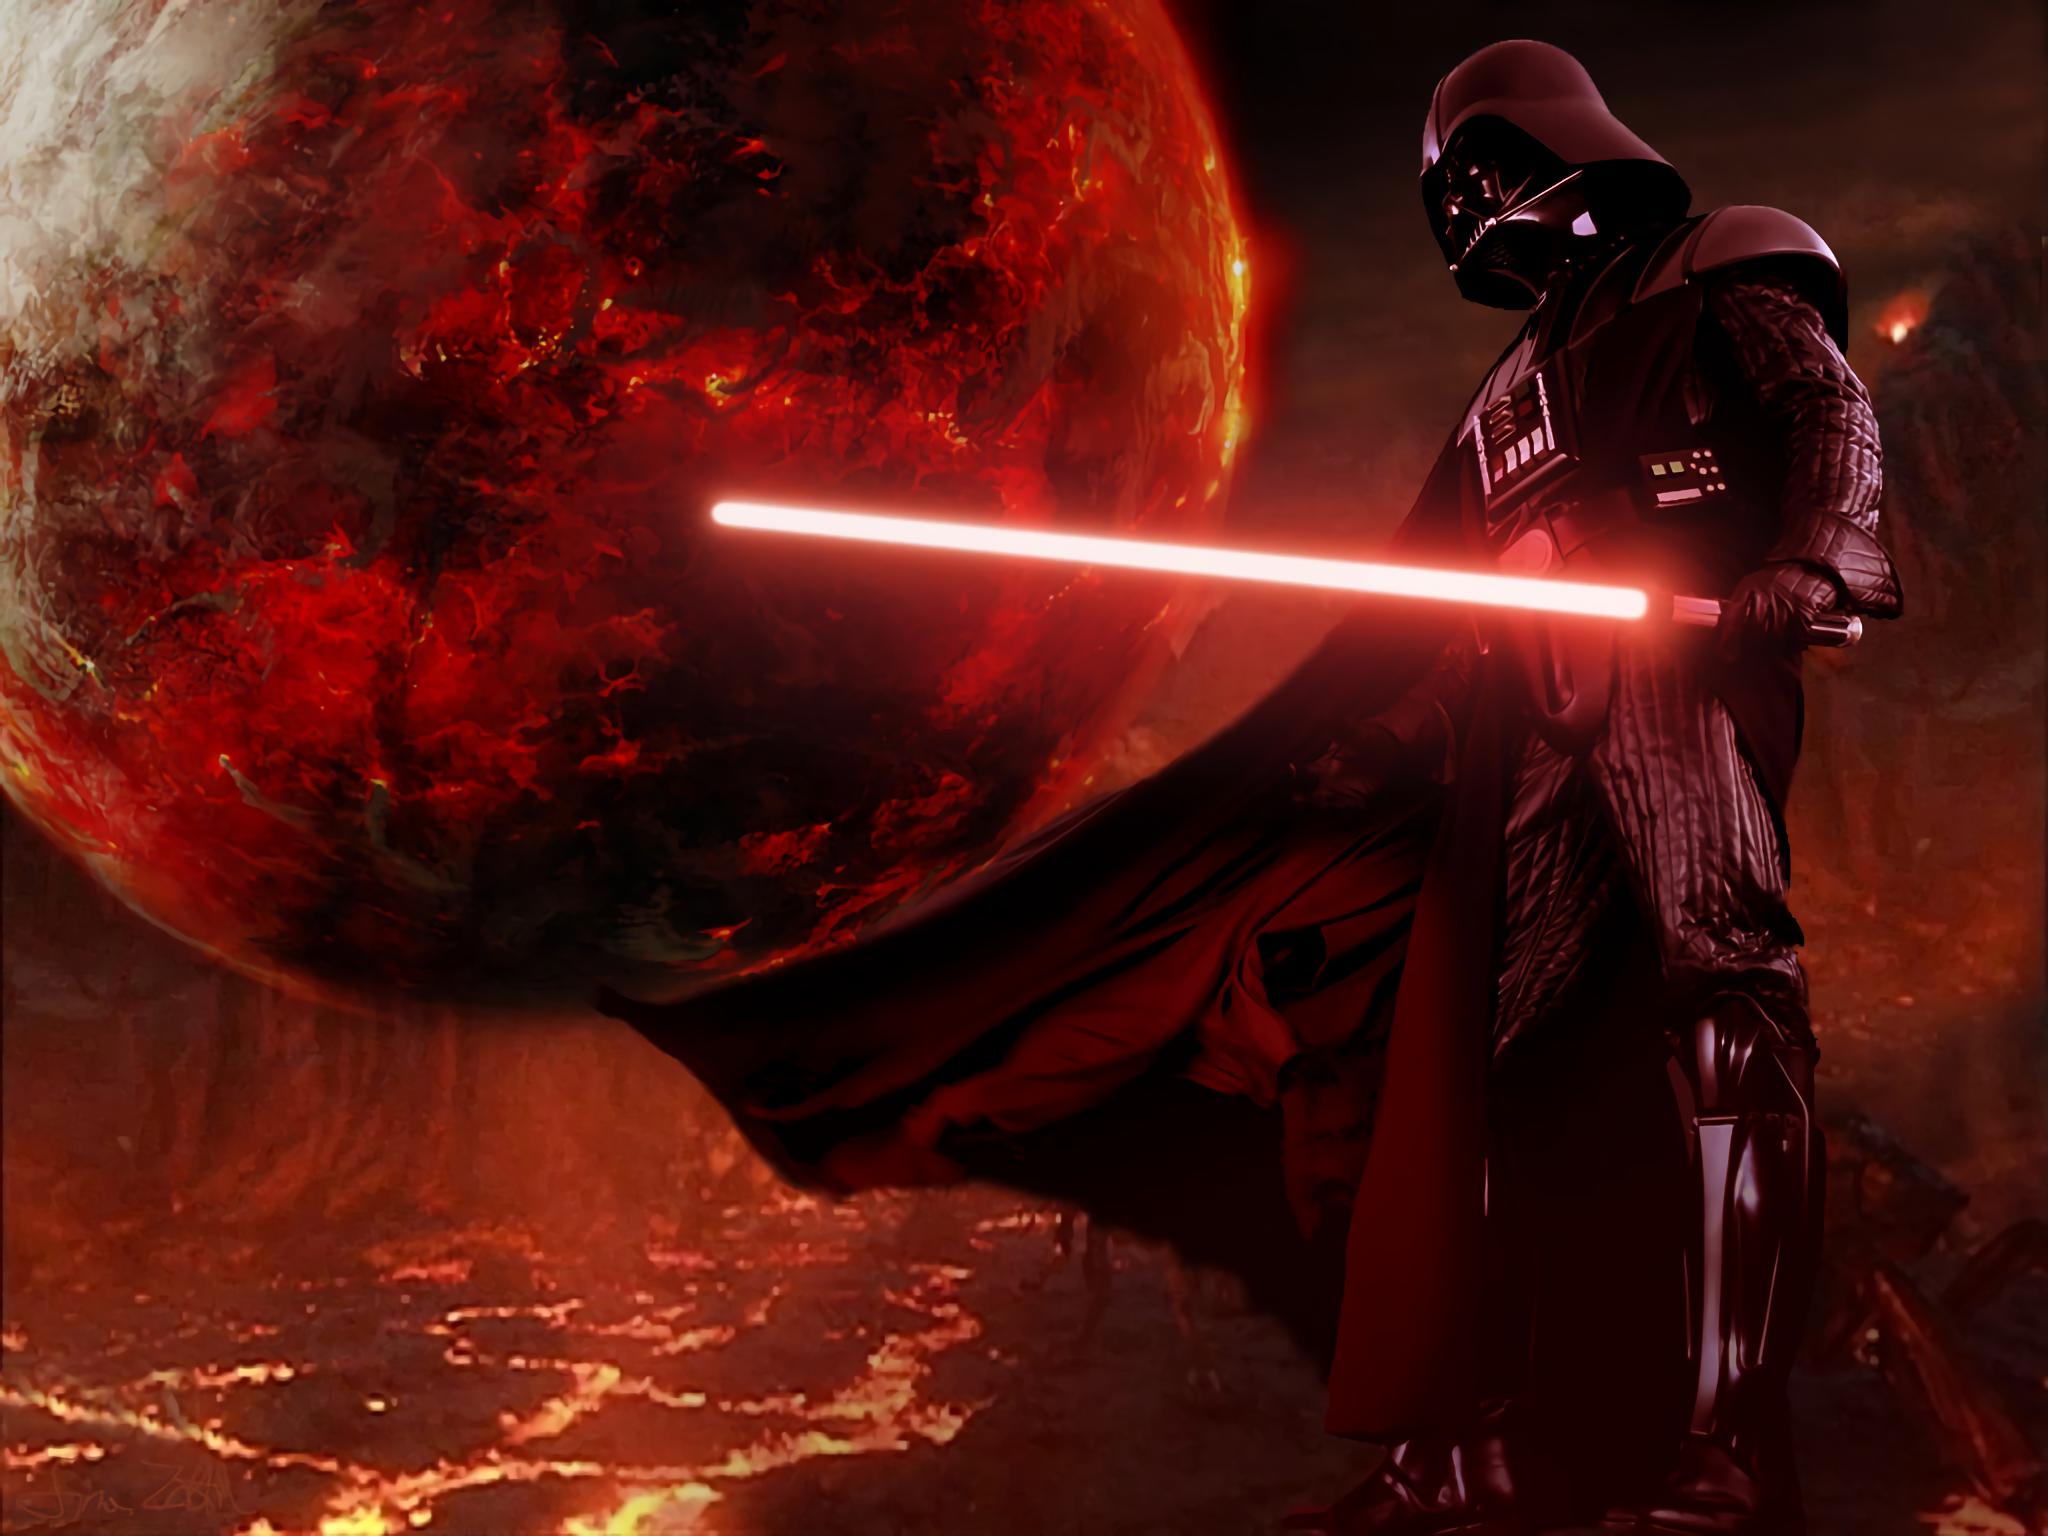 Anakin Skywalker Wallpaper Hd 2048x1536 Wallpaper Teahub Io